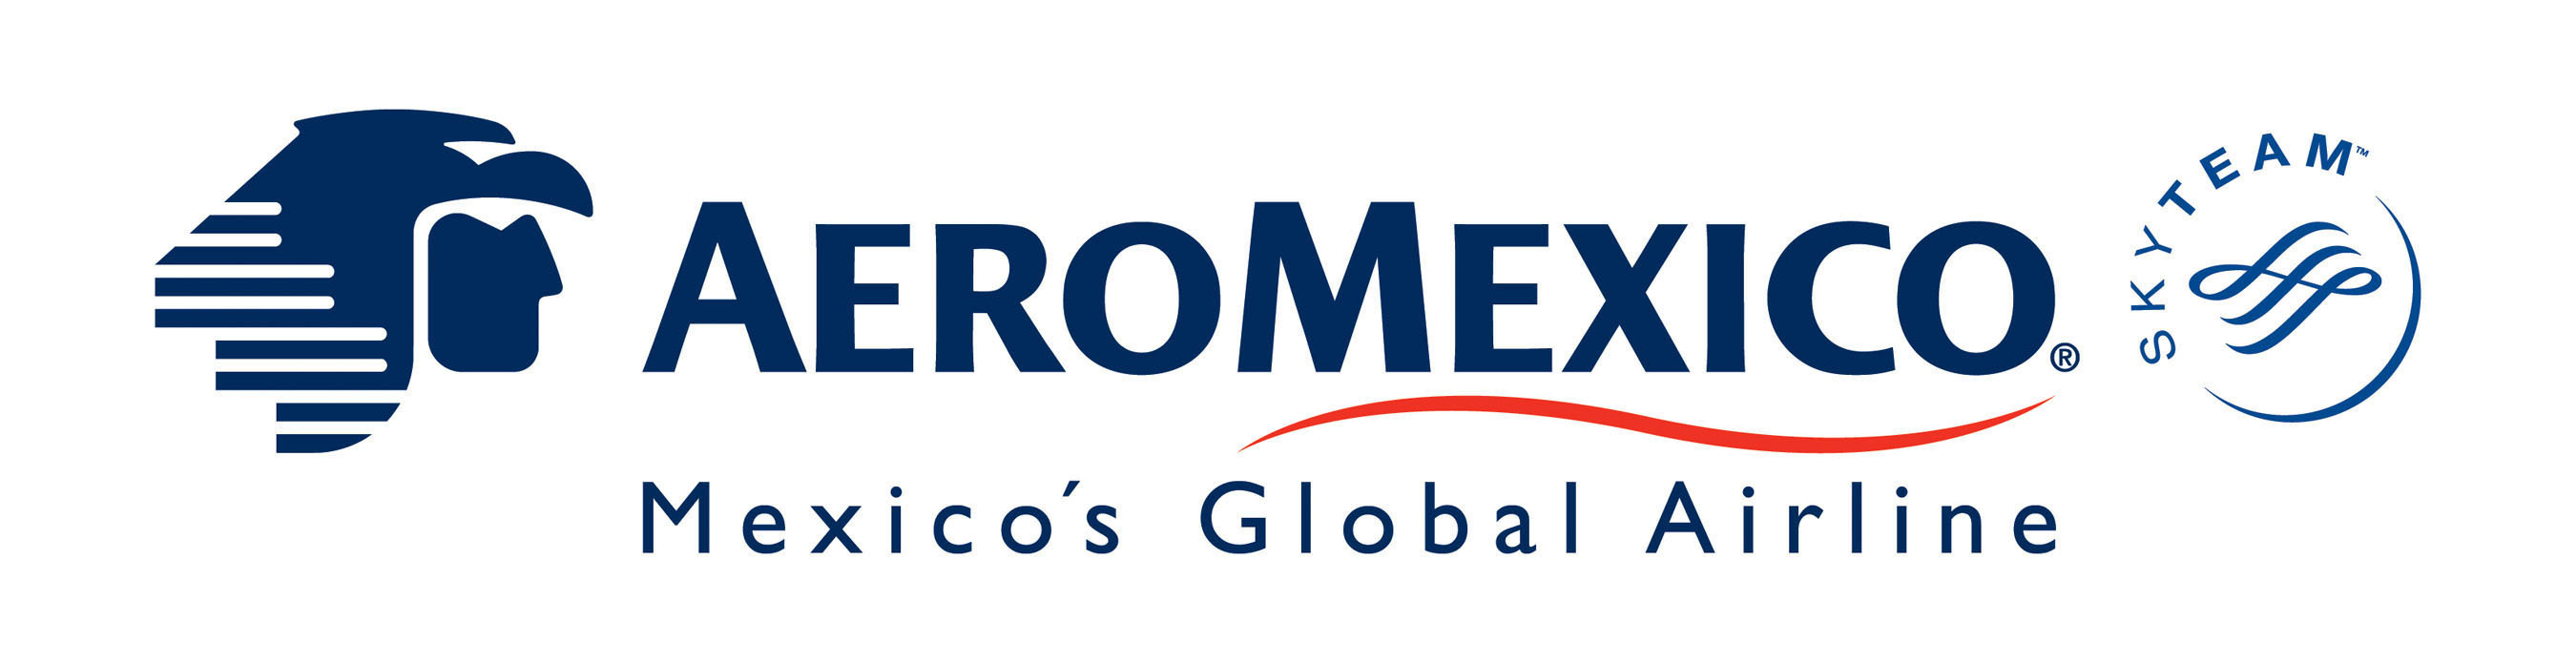 Aeromexico Logo. (PRNewsFoto/